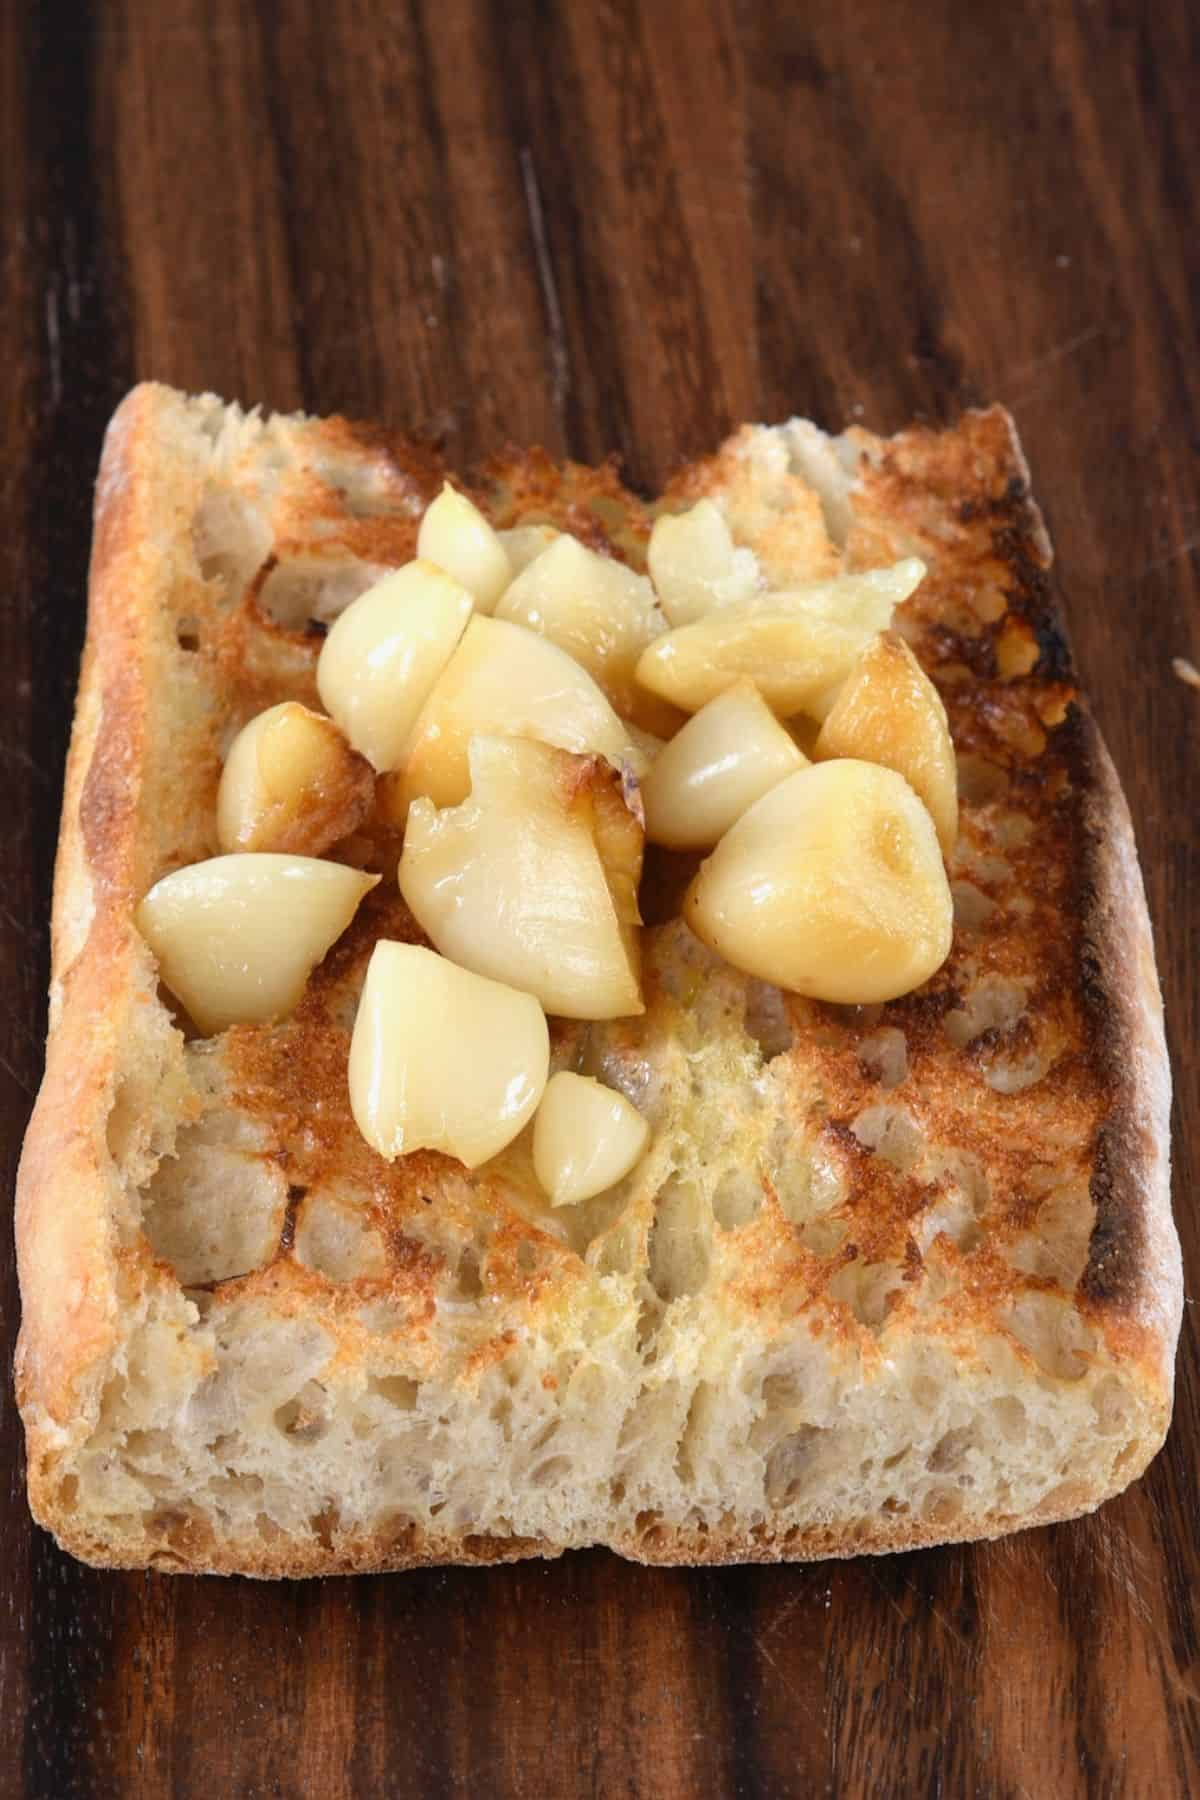 Roasted garlic cloves on top of toast